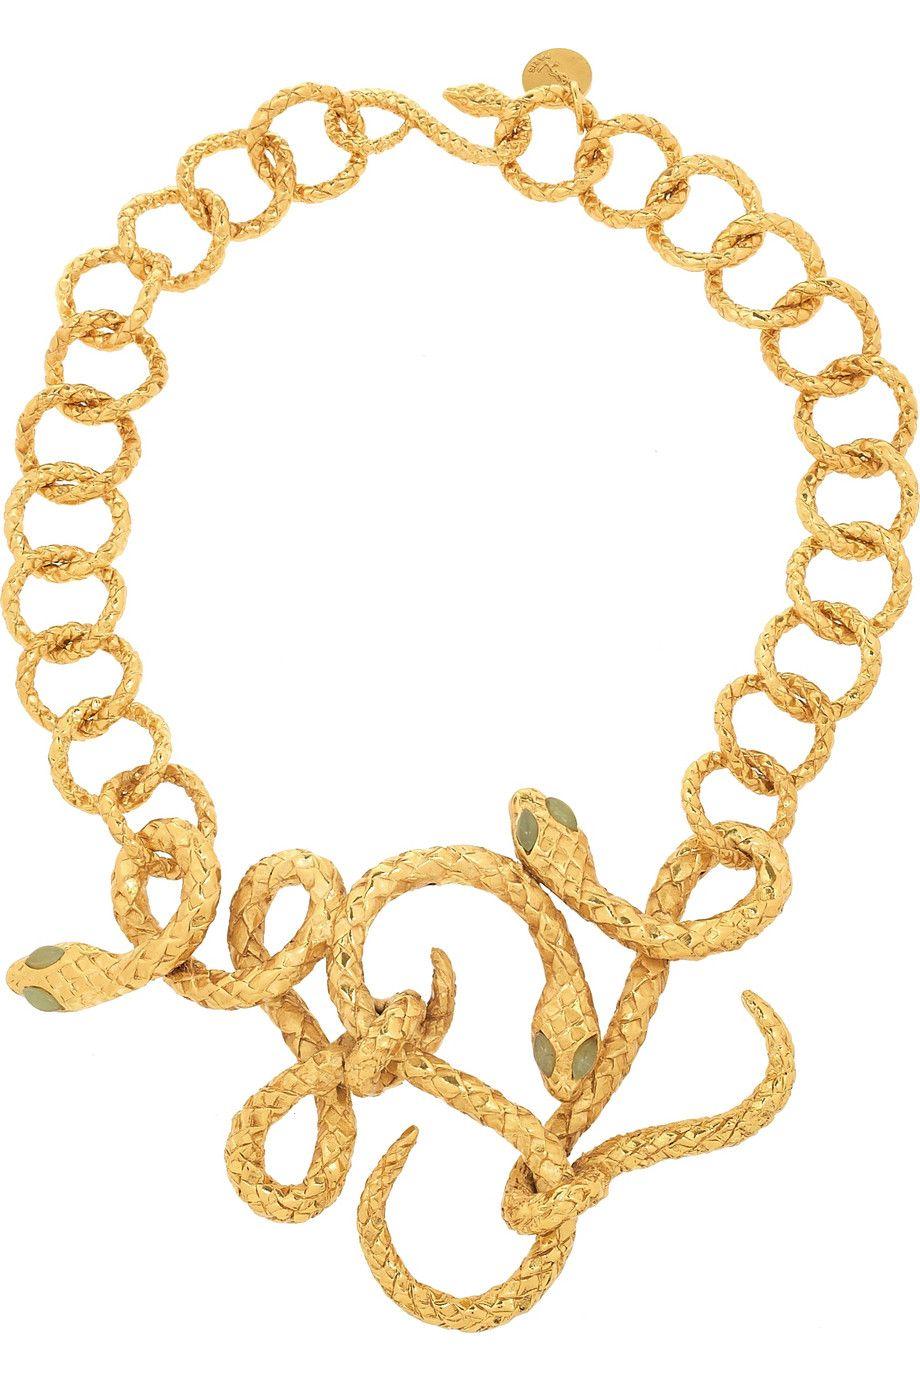 Golen serpentine chain and jade yves saint laurent necklaces